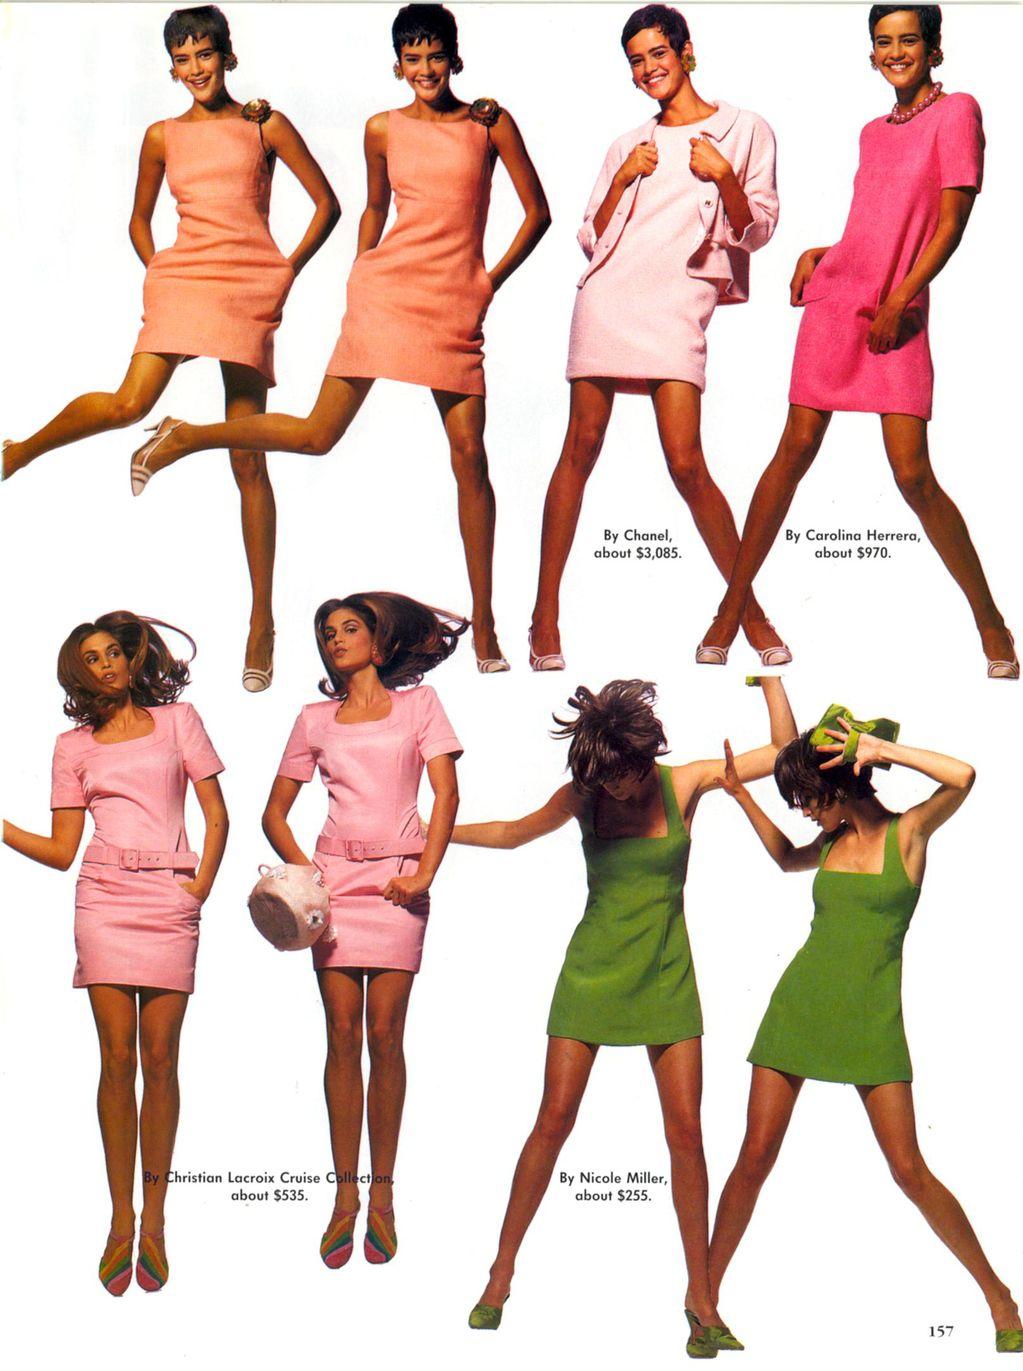 Vogue January 1991 | Great Buys - Dress Rehearsal 06.jpg